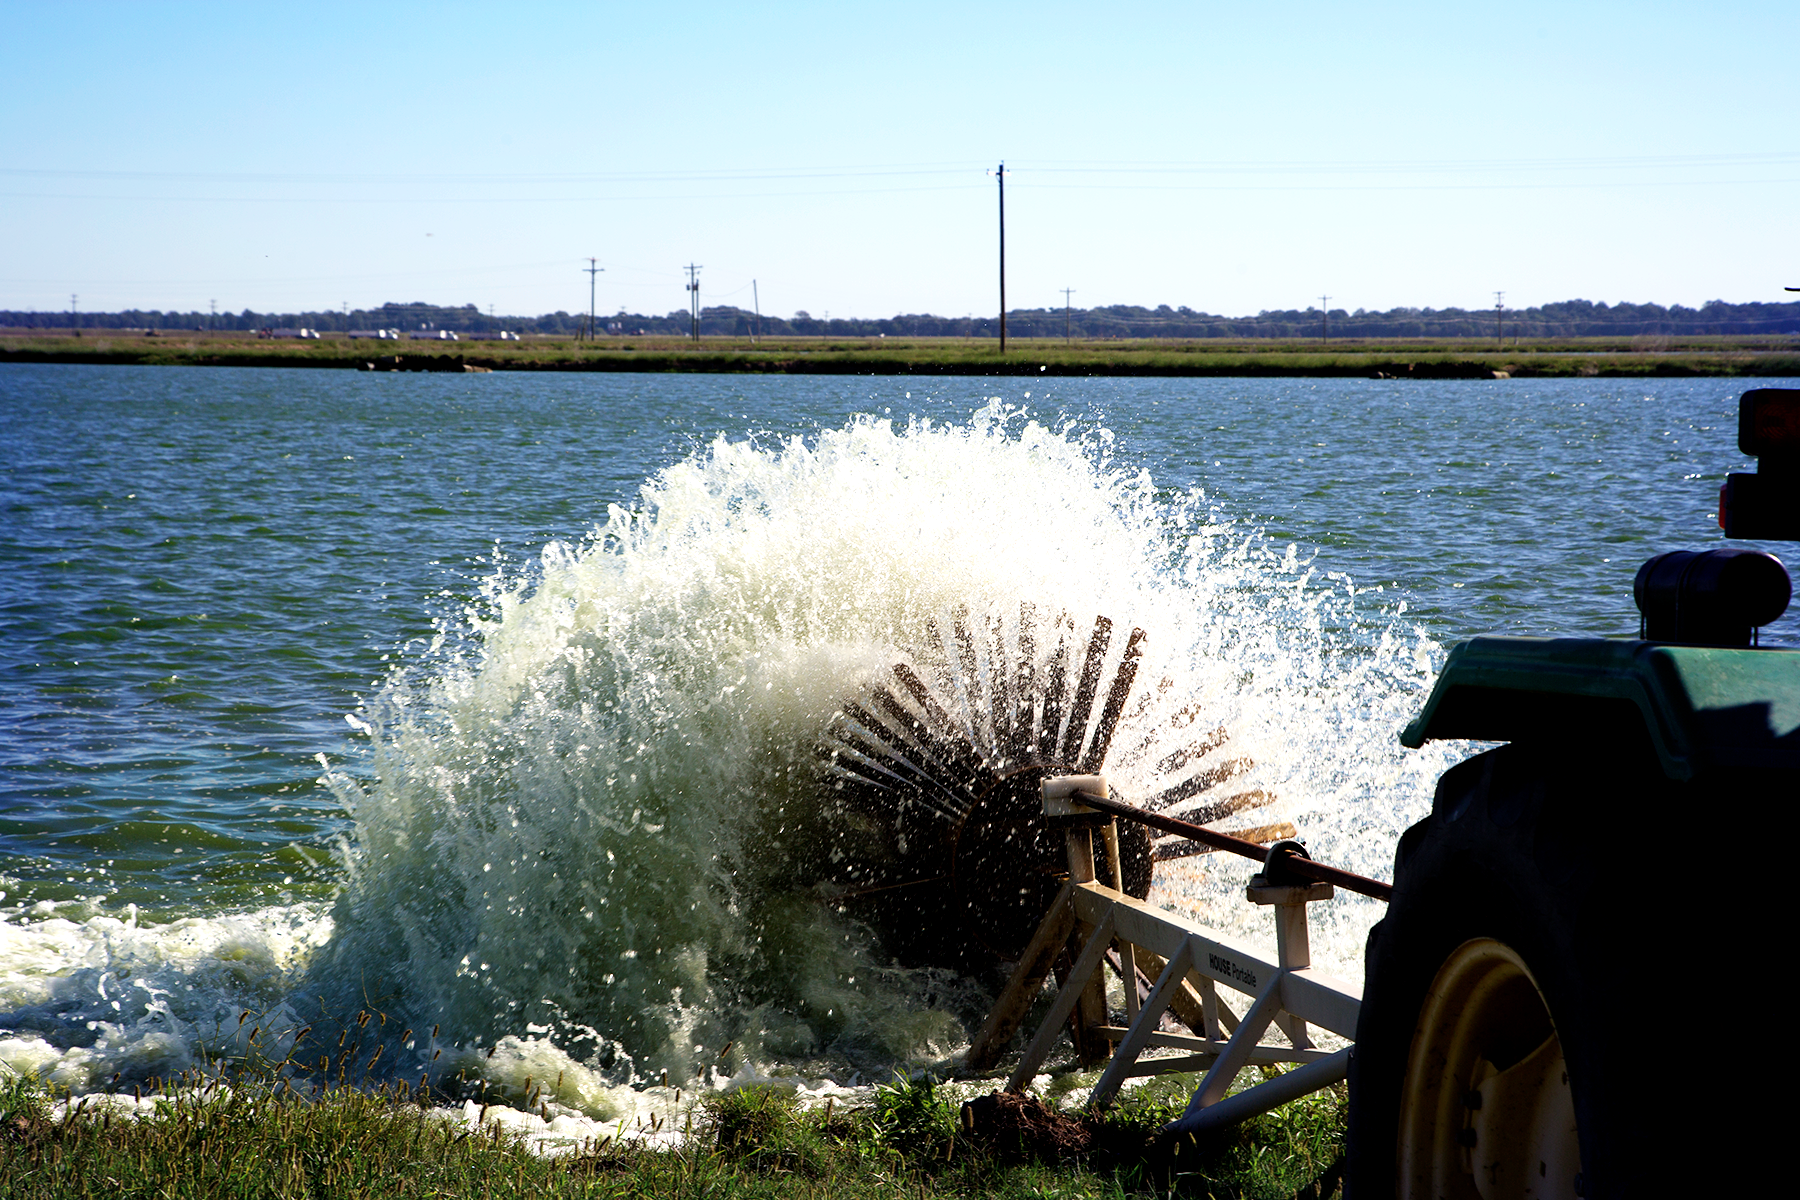 Delta Aquaculture on the Rise